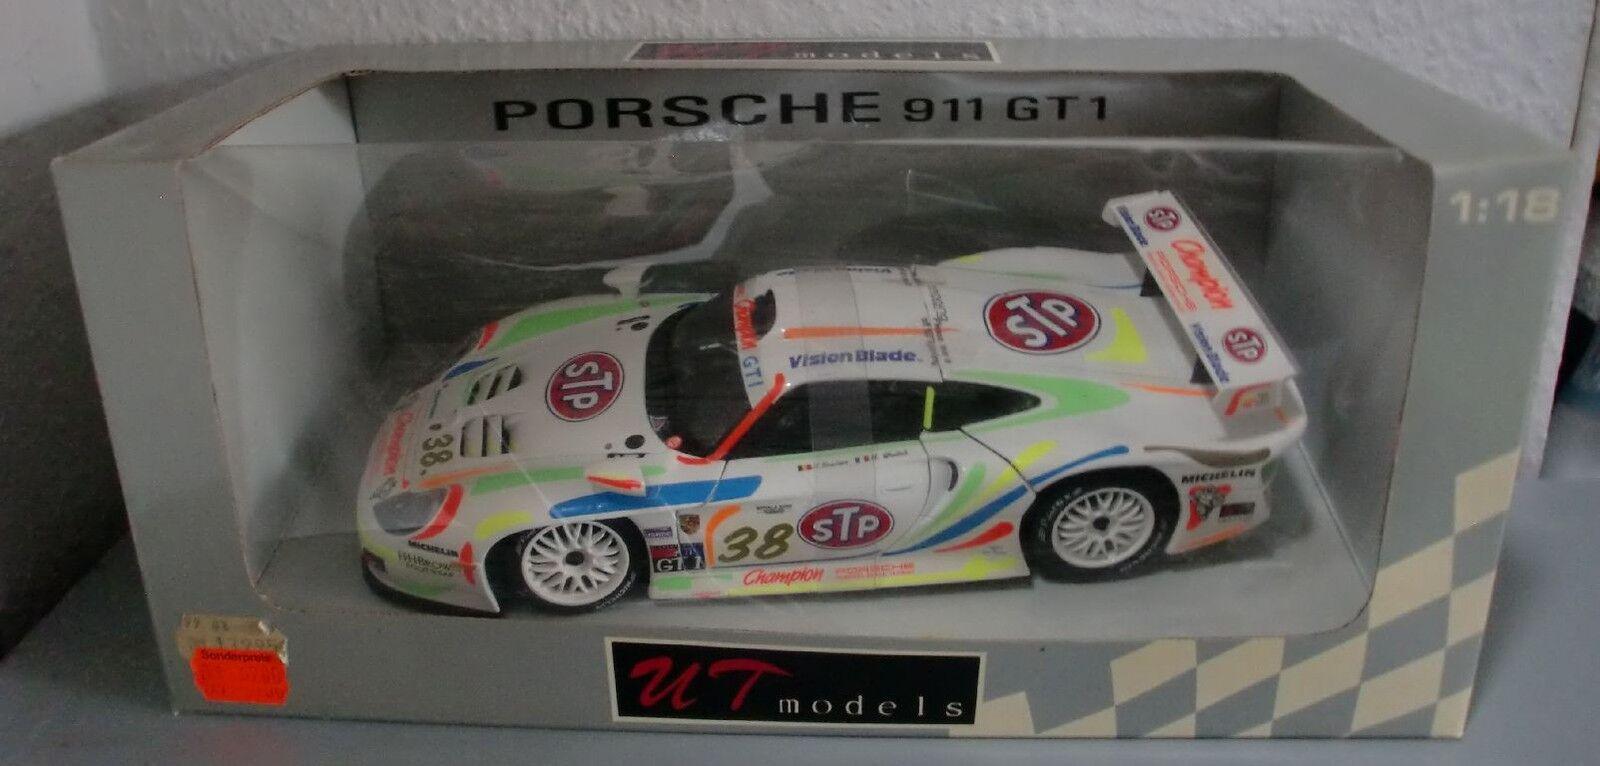 venta de ofertas PORSCHE 911 GT1, STP, Nr. 38, UT models, Neuwertig, Neuwertig, Neuwertig, OVP, 1 18  venta al por mayor barato